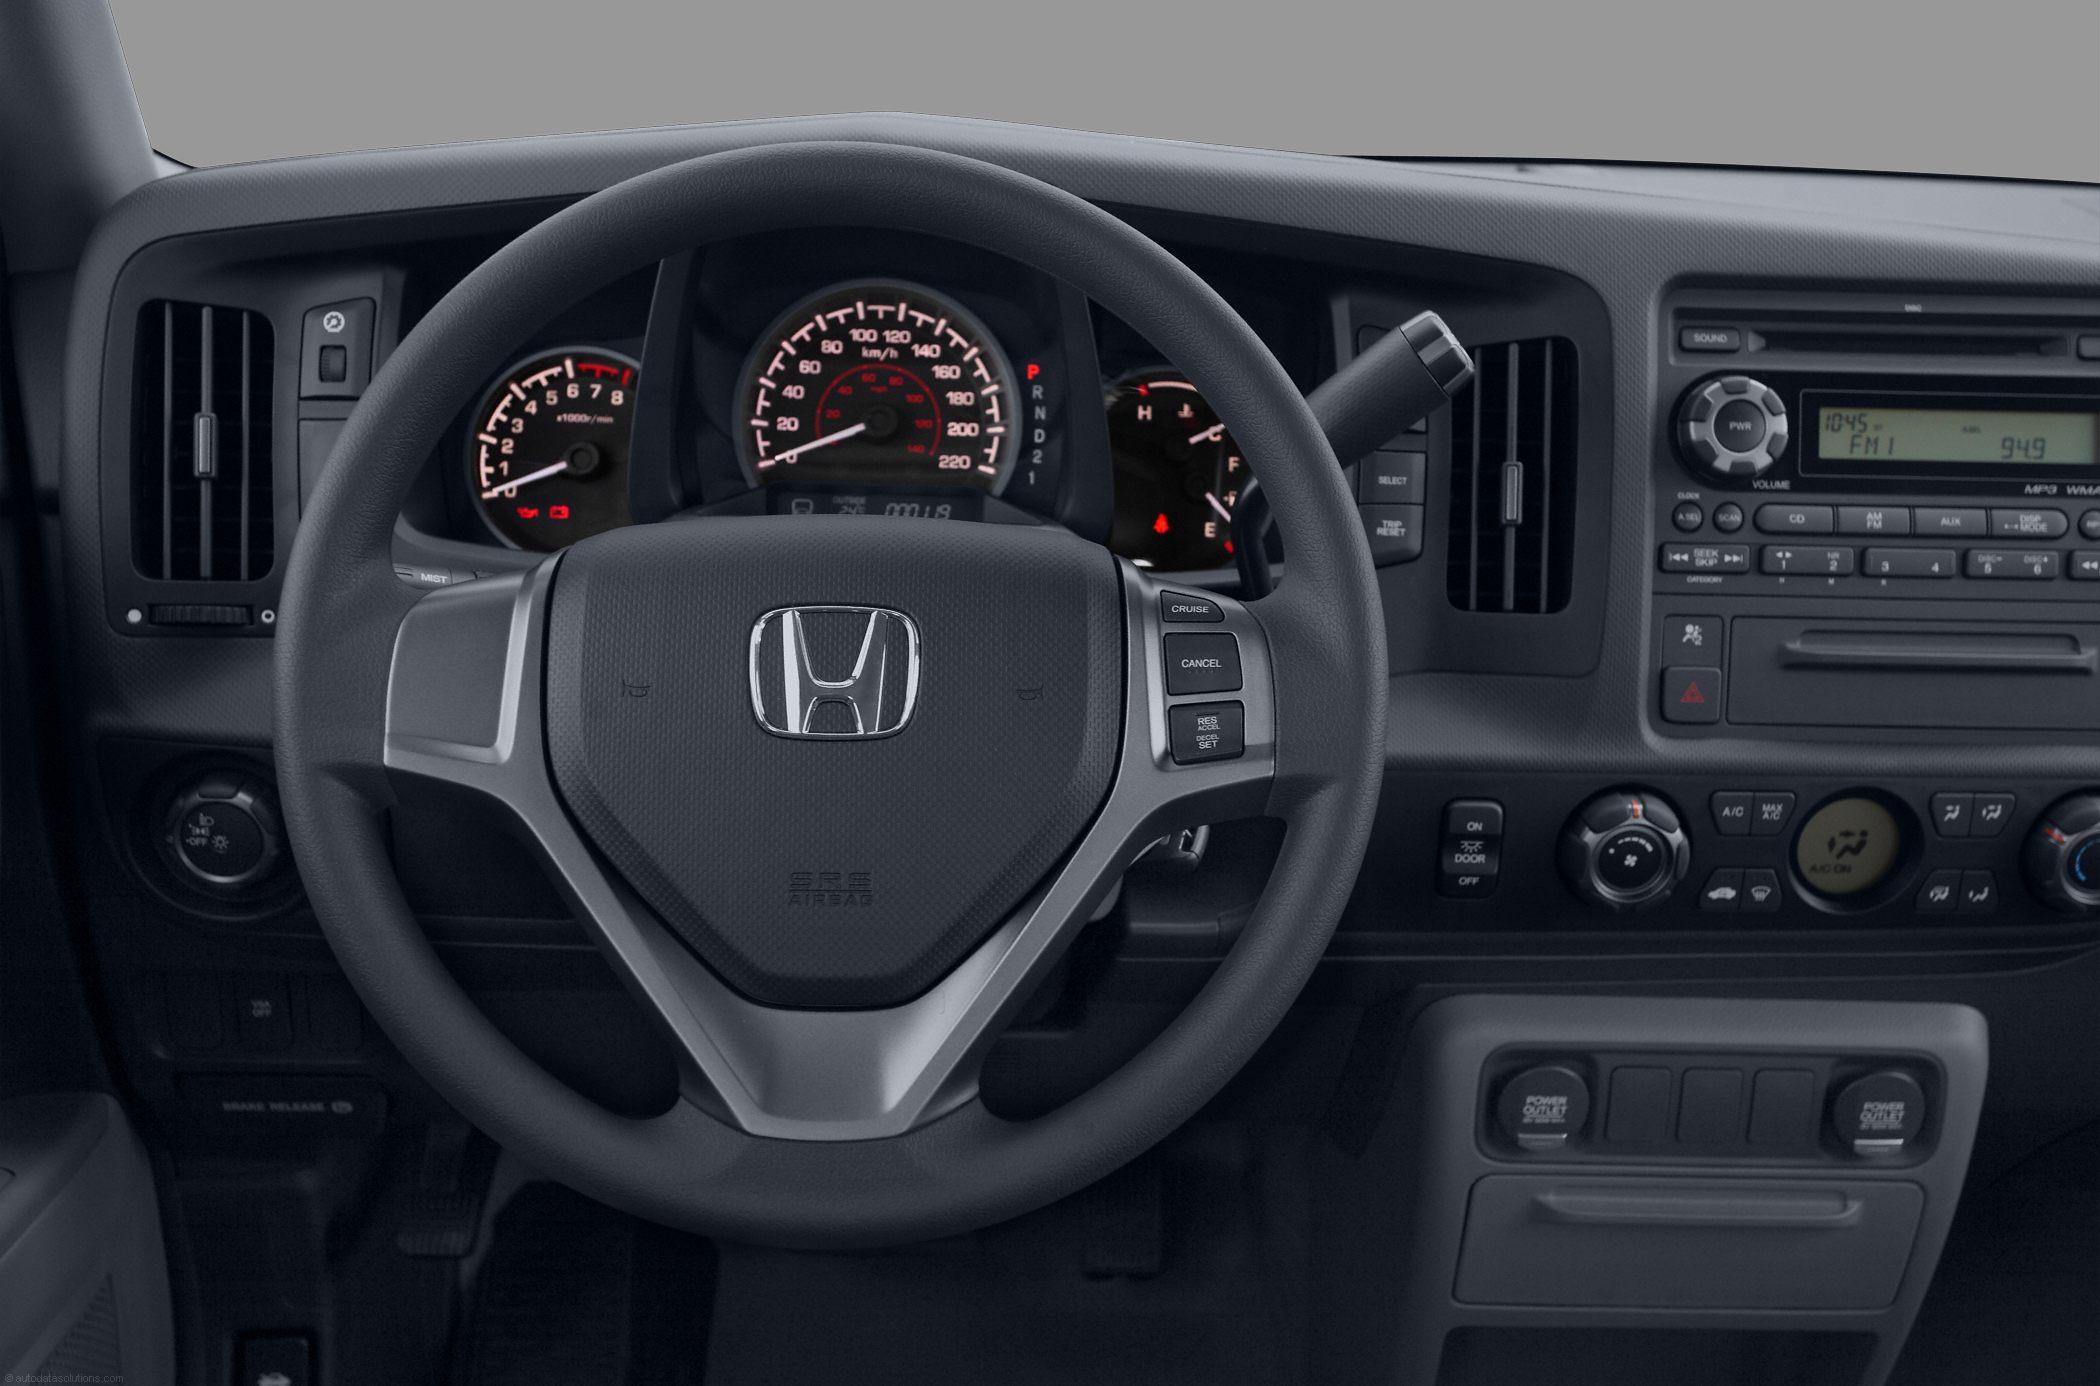 2011 Honda Ridgeline Image 16